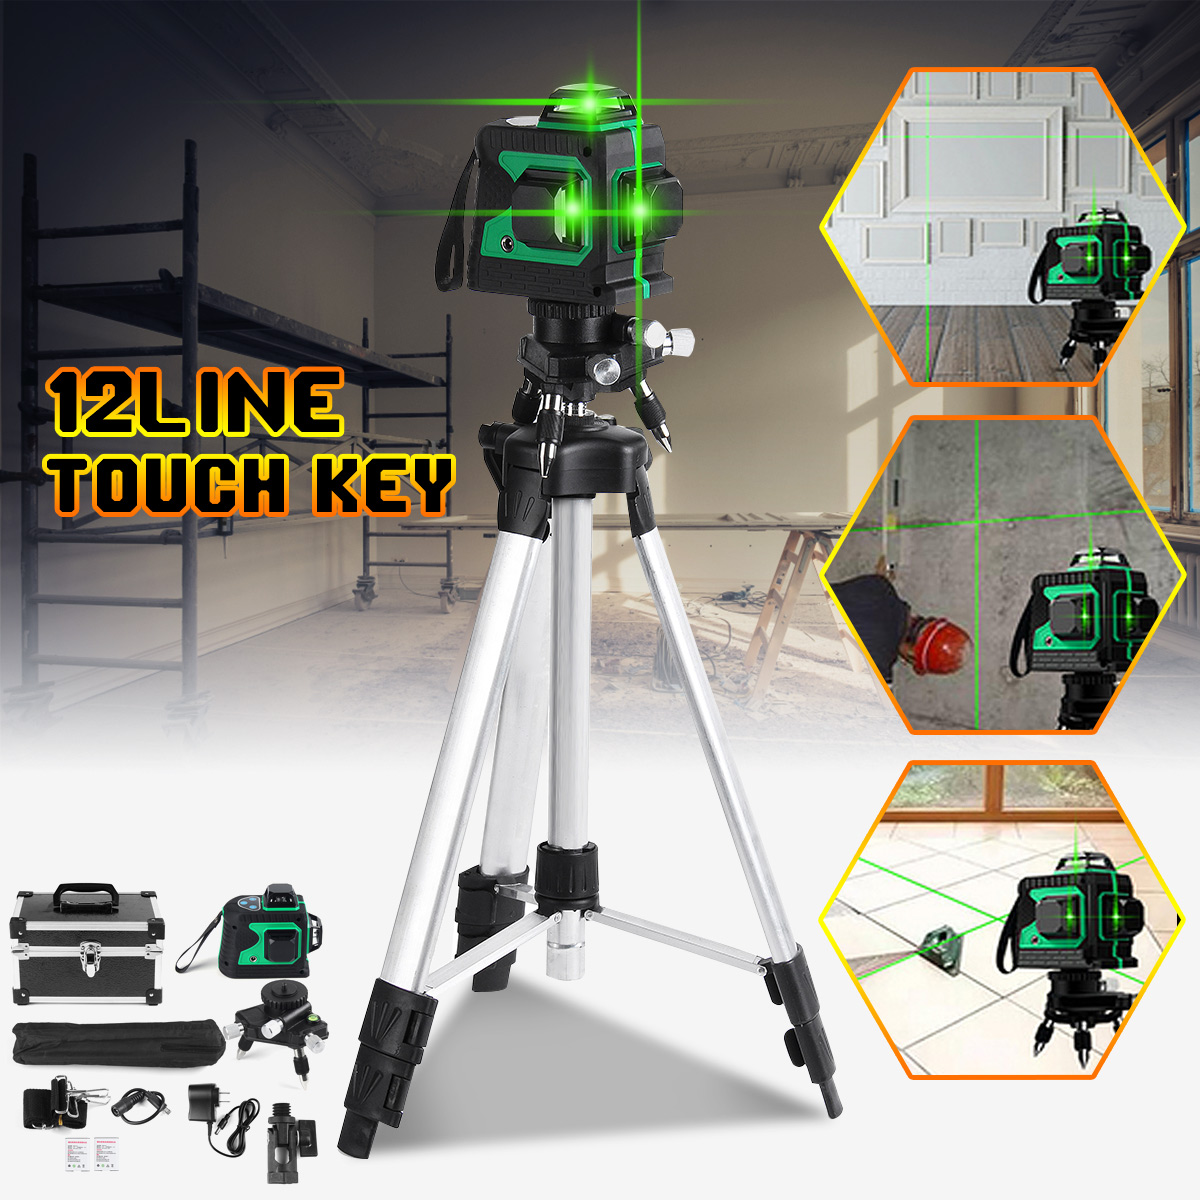 12 Line 3D Green Light Laser Level Self Leveling Measure 360 Horizontal Vertical Cross Super Powerful Laser Beam w/Tripod Stand